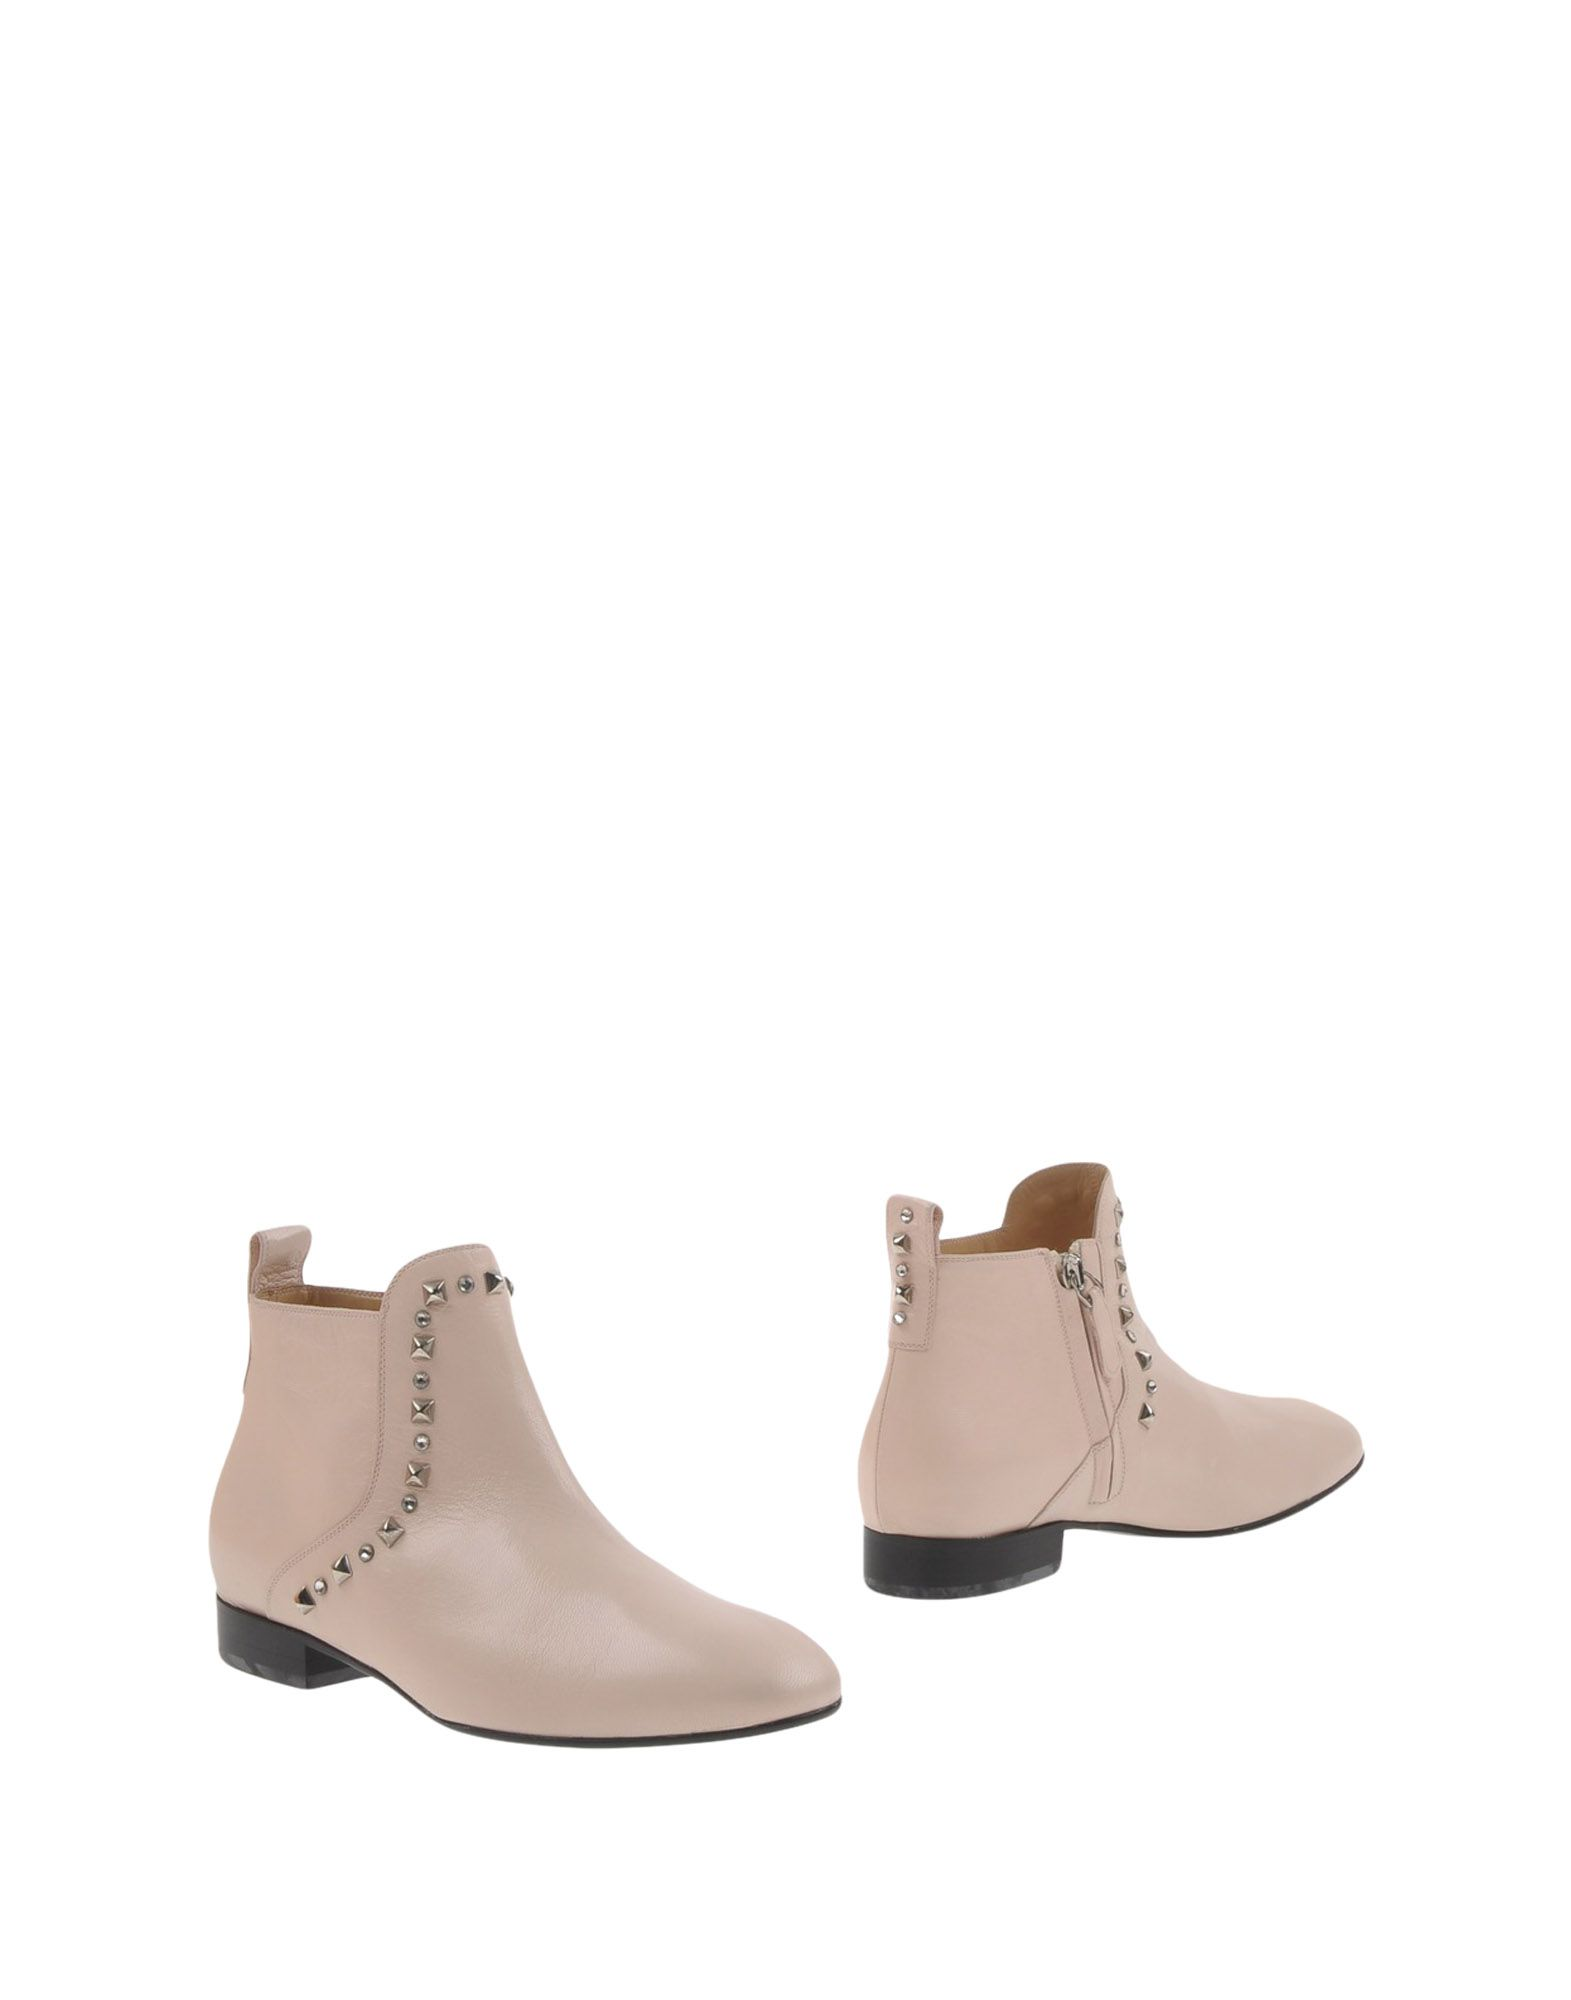 Kallistè Stiefelette Damen  11333046QE Gute Qualität beliebte Schuhe